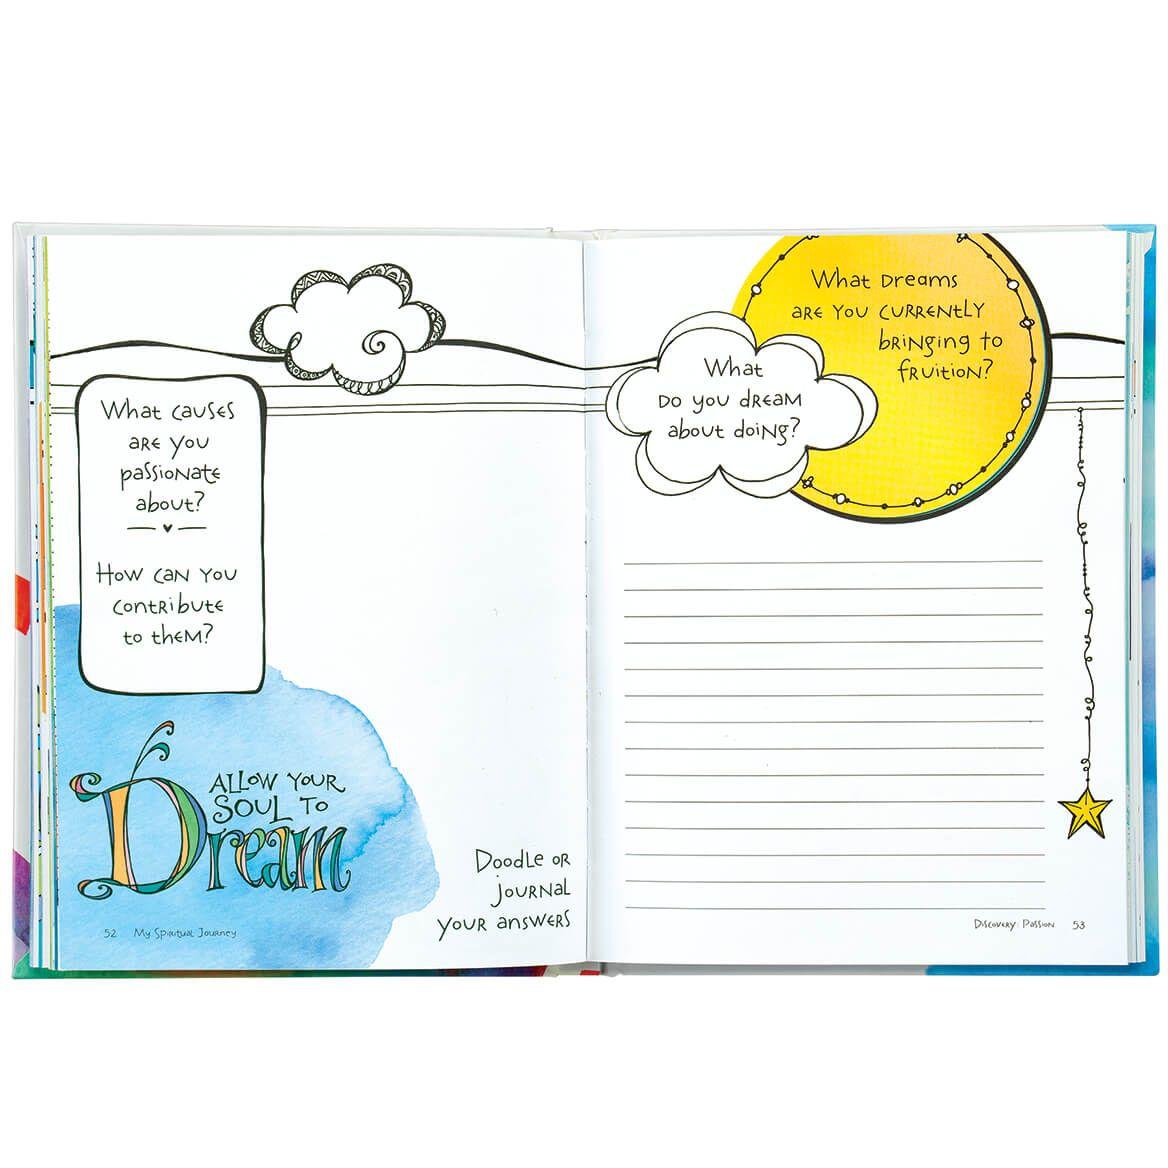 My Spiritual Journey Guided Journal-371534